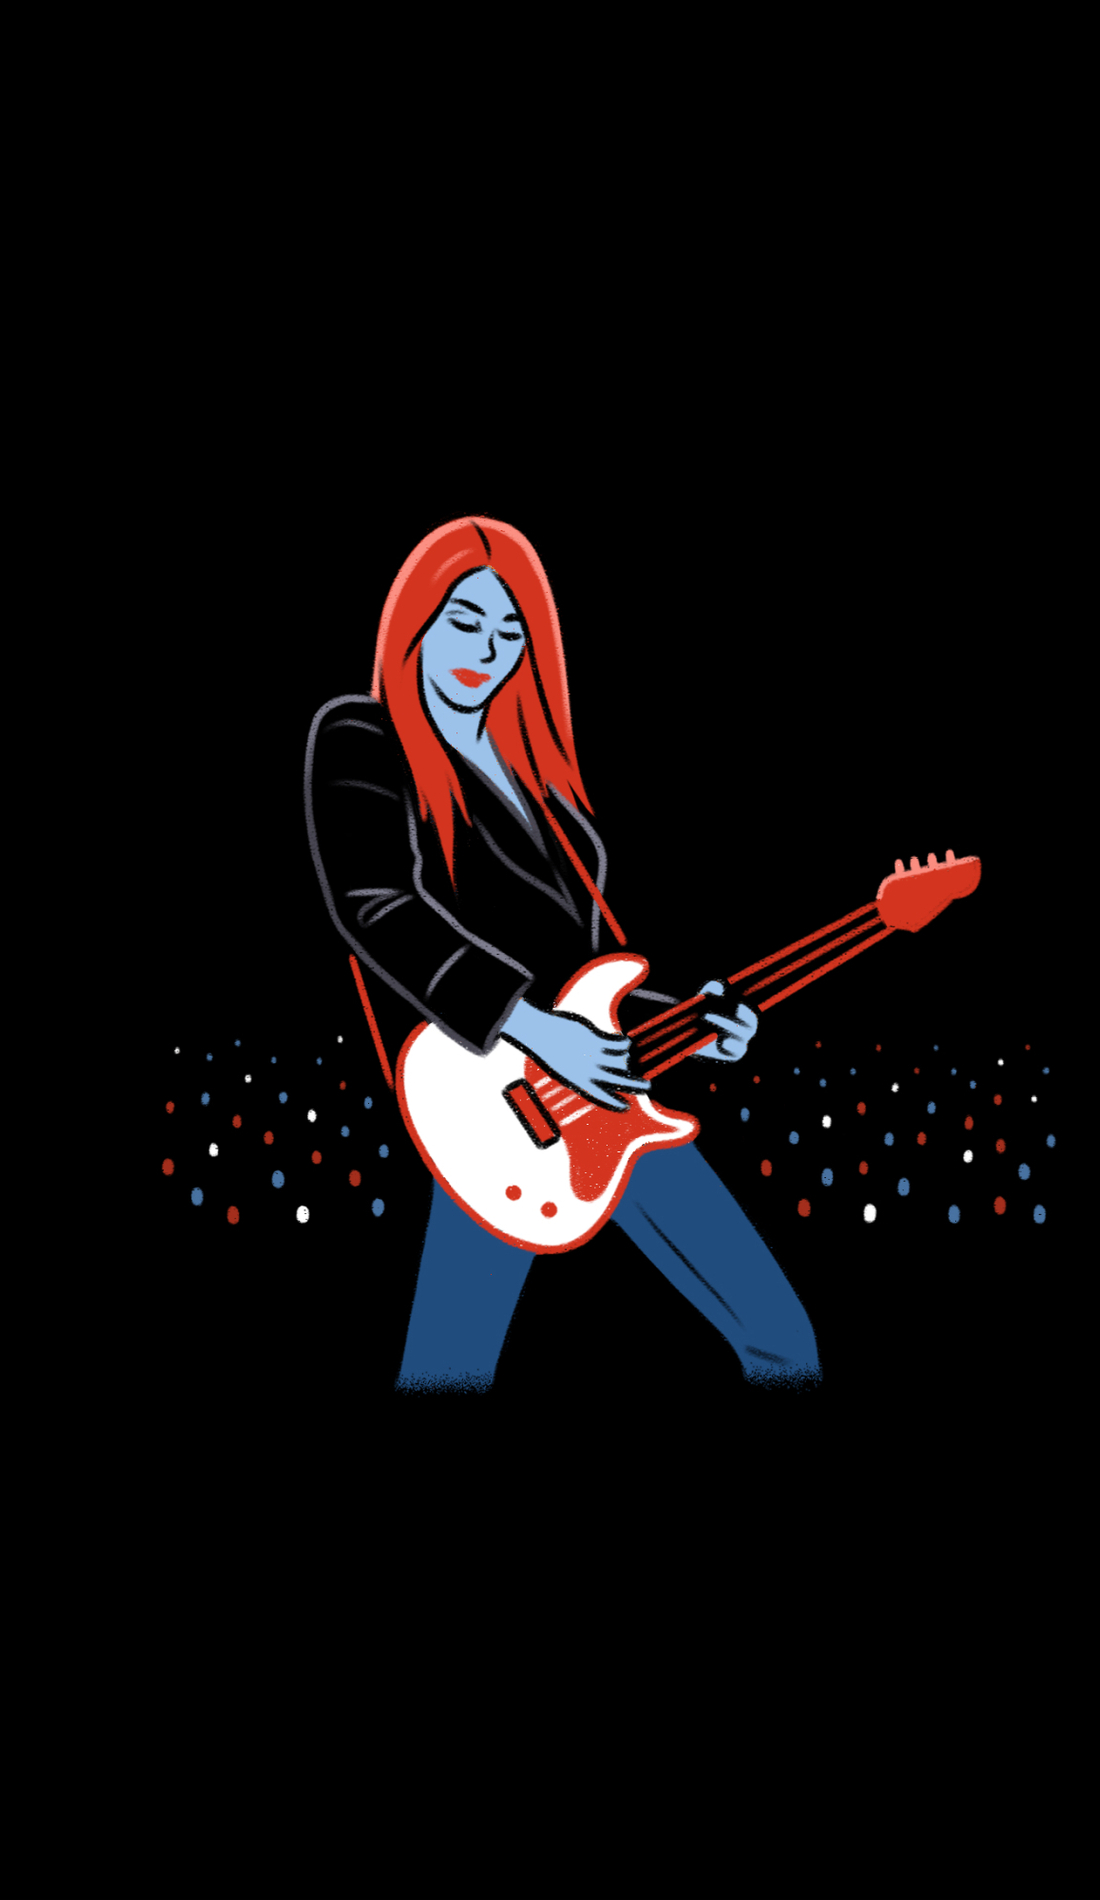 A Nightrain live event